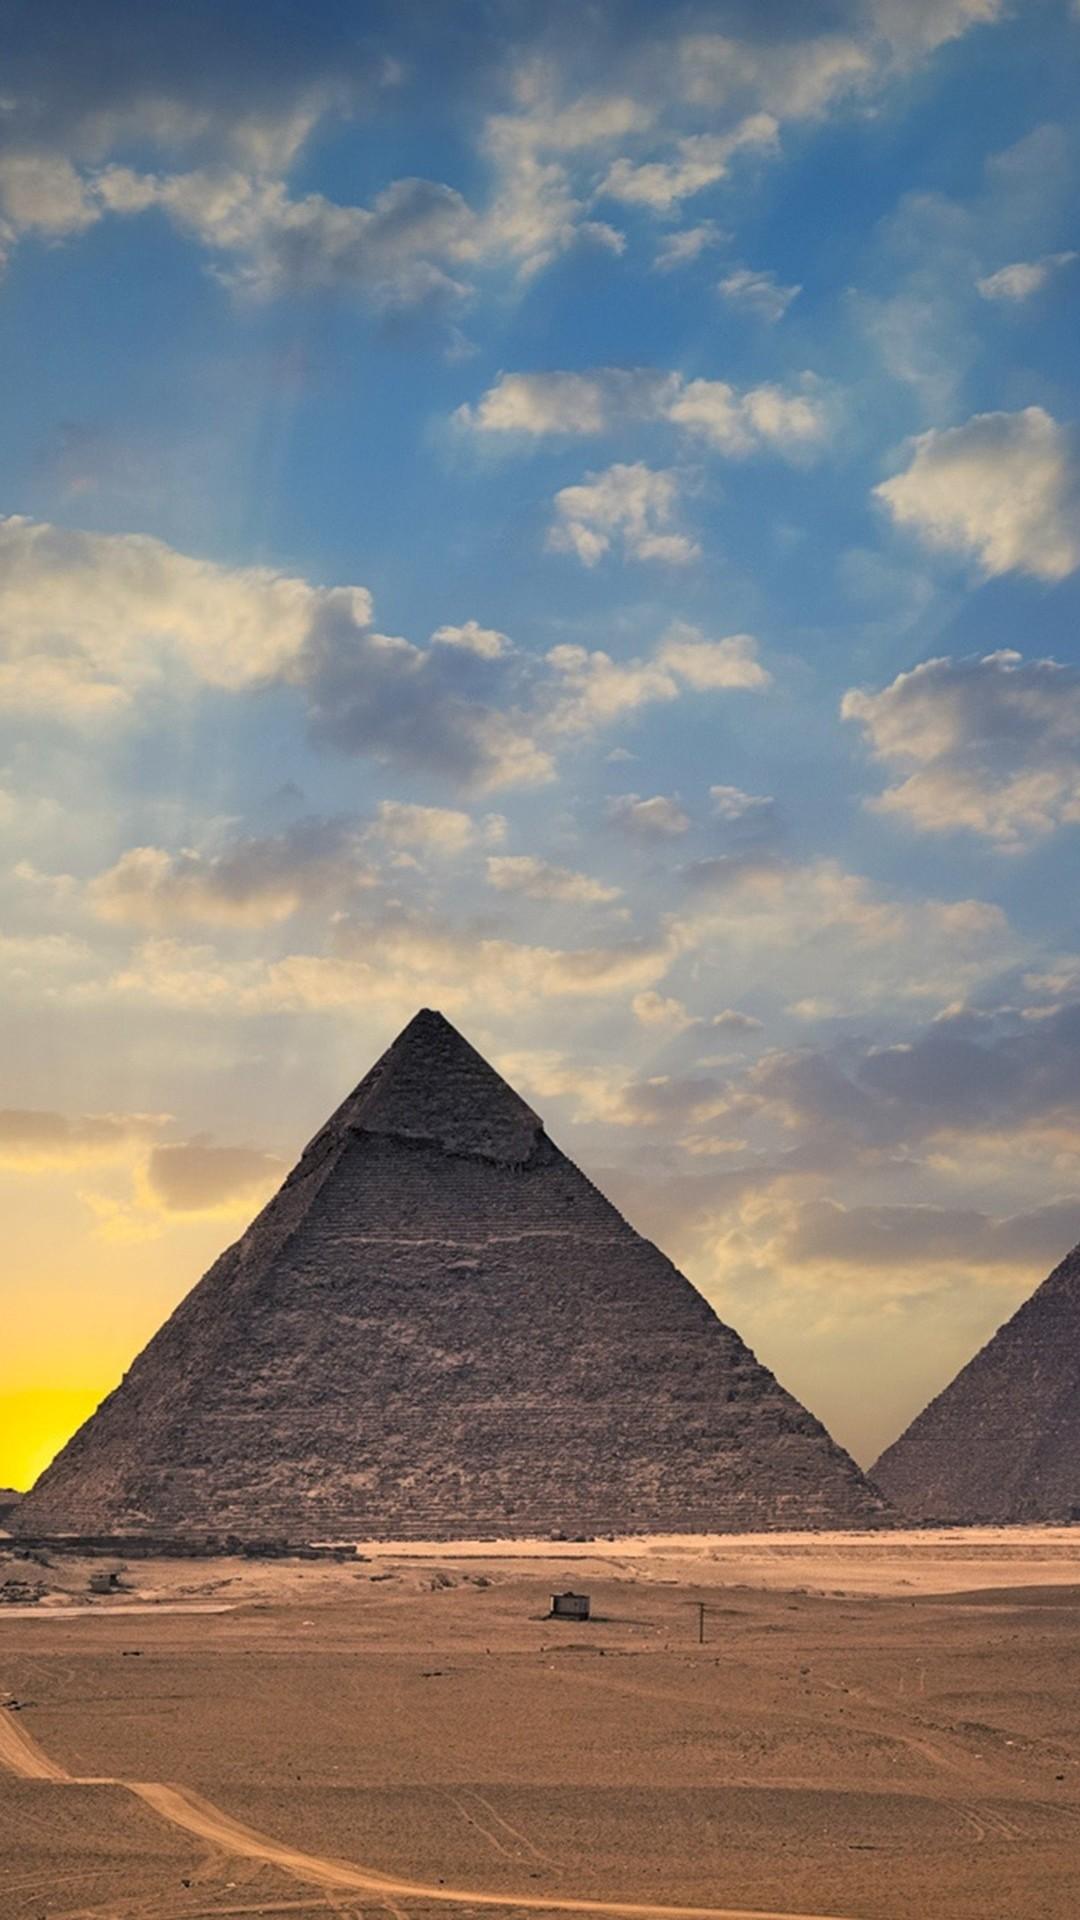 Egypt pyramids 4K Ultra HD wallpaper   4k-Wallpaper.Net